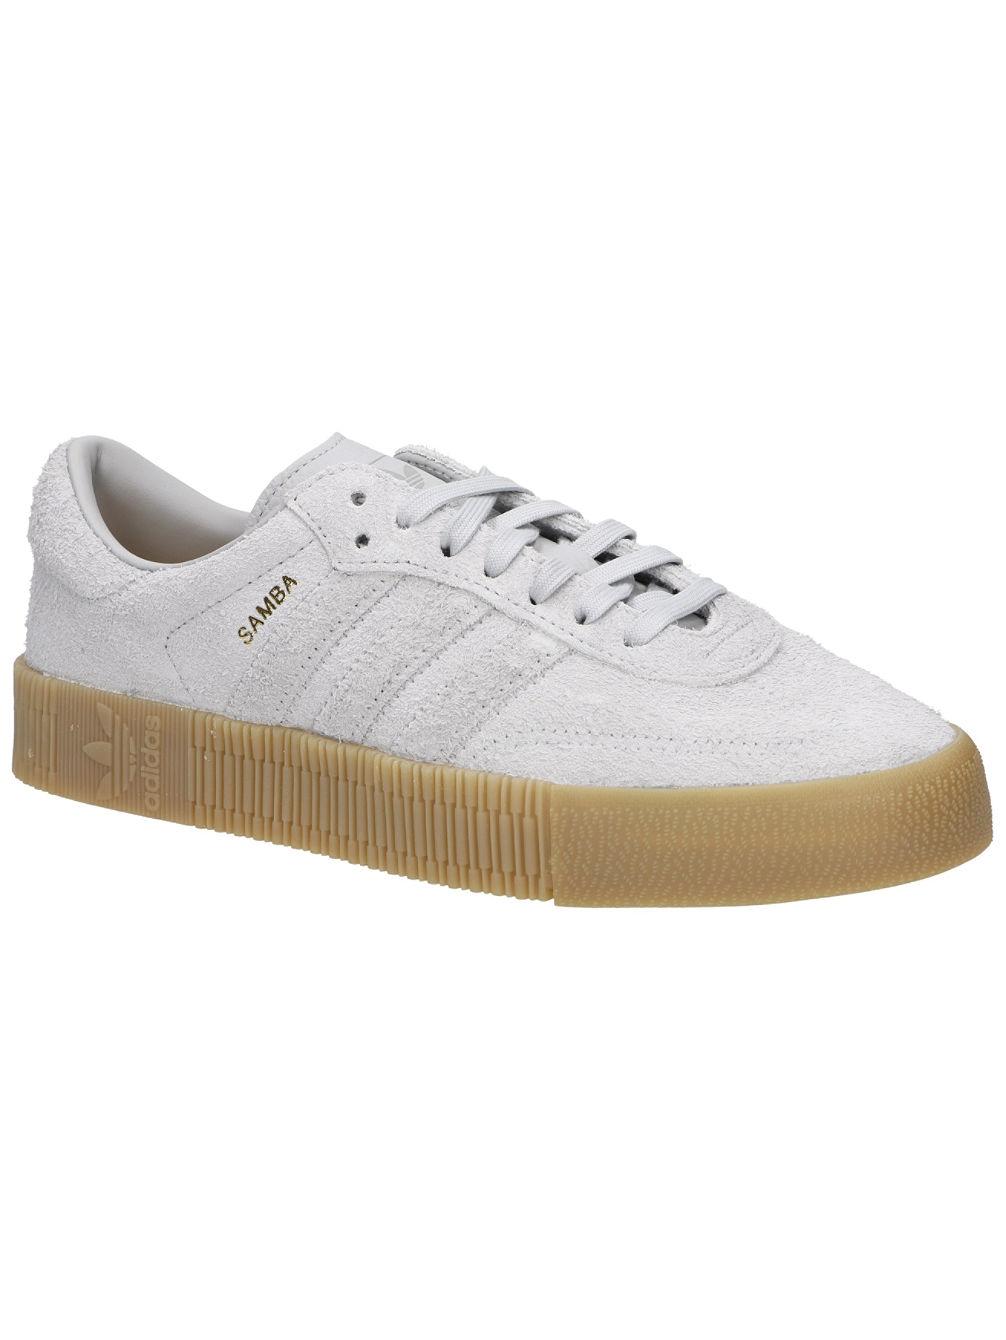 2ce1367efbc067 adidas Originals Sambarose Sneakers online kaufen bei Blue Tomato